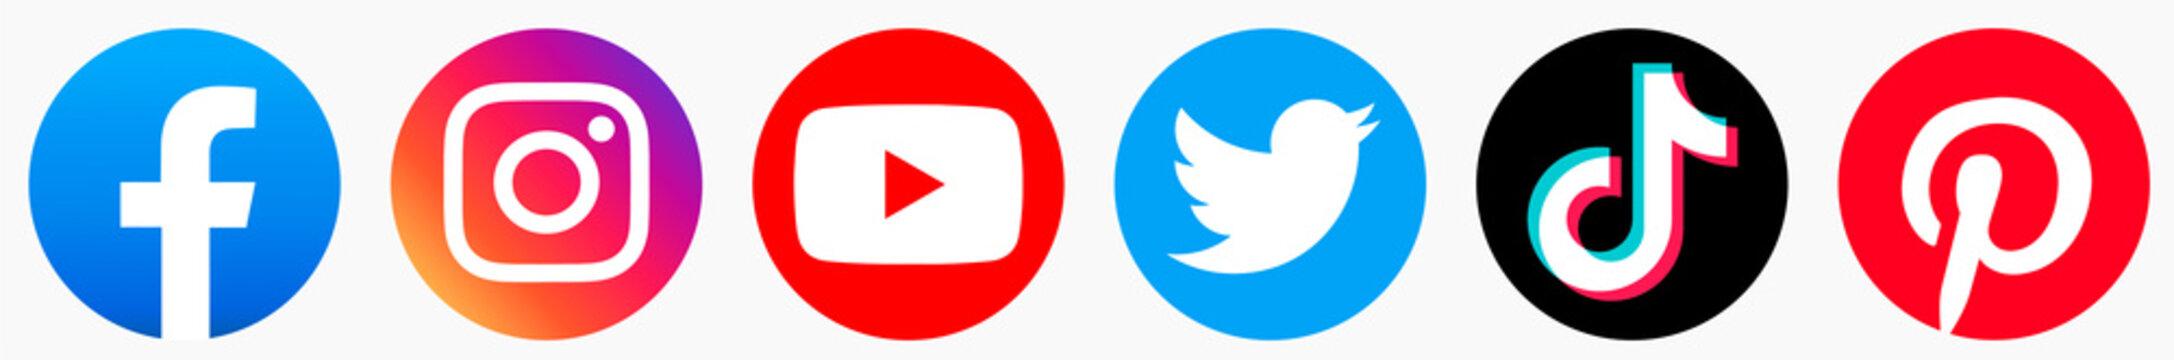 facebook, instagram, twitter, youtube, tik tok,pinterest logo. facebook, instagram, twitter, youtube, tik tok,pinterest jpg. facebook, instagram, twitter, youtube, tik tok,pinterest  download